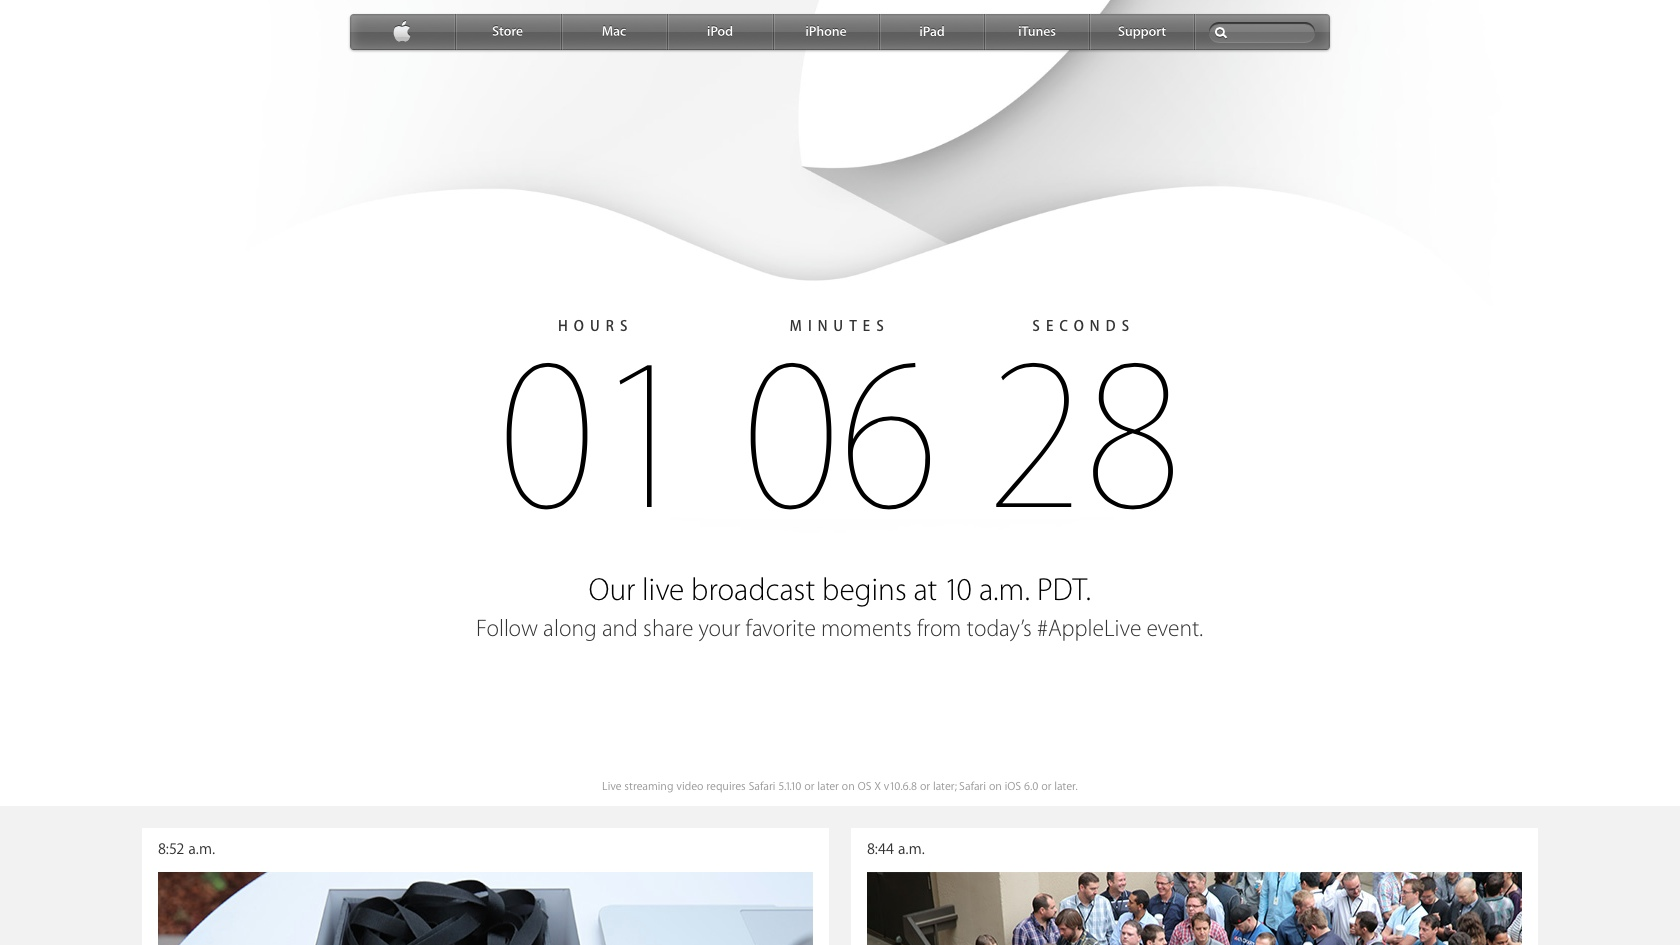 Apple Special Event 20140909 on Appledotcom